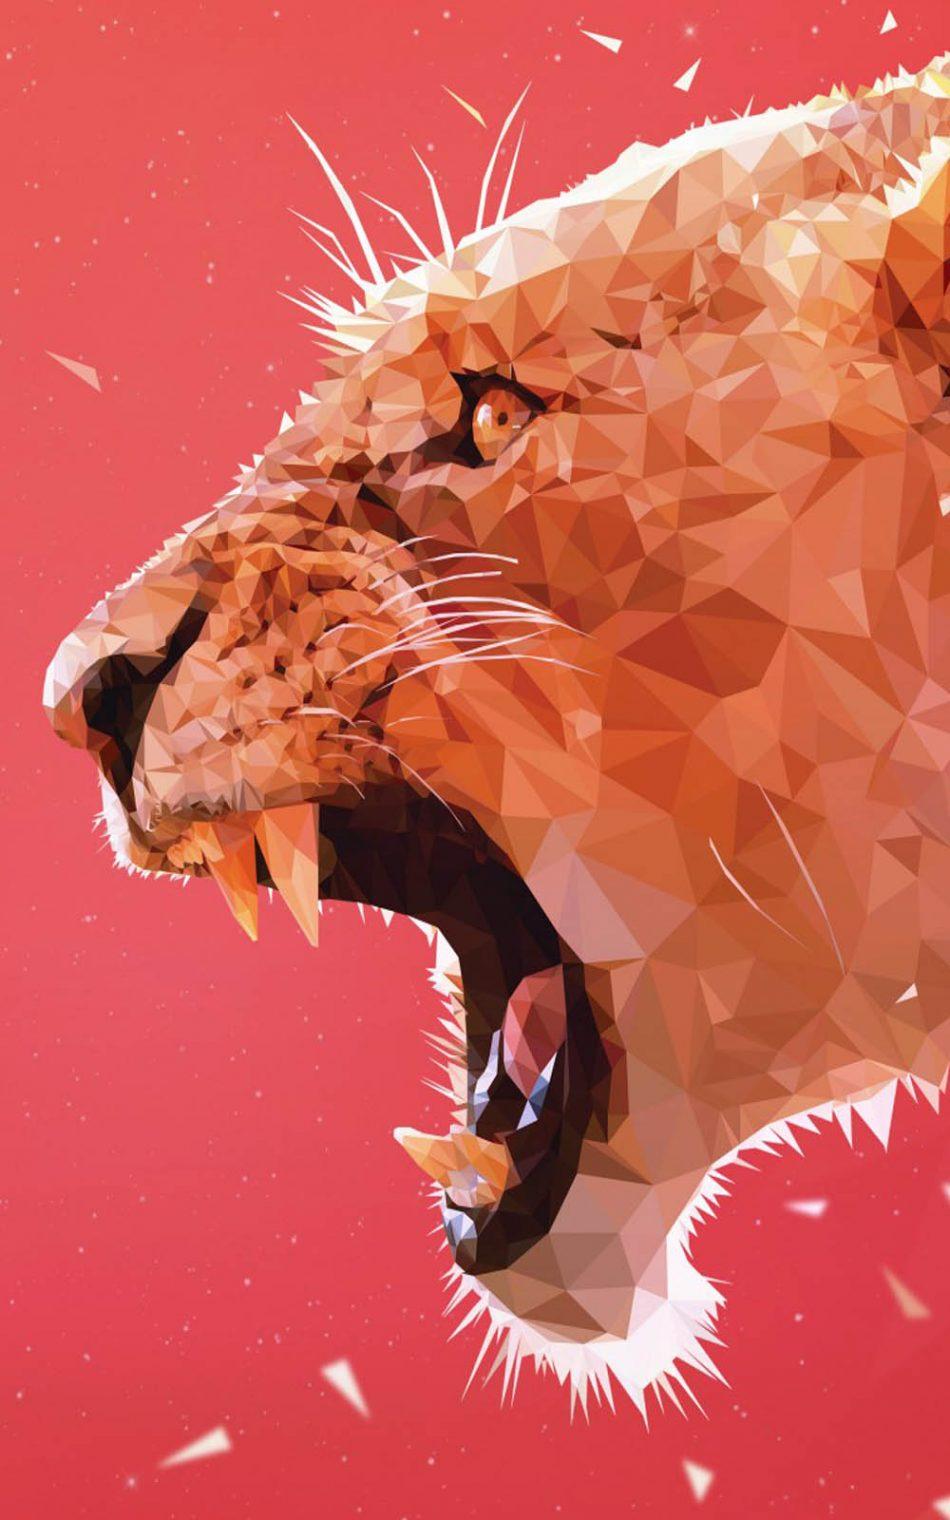 Good Wallpaper Mobile Lion - Roaring-Lion-Abstract-Artwork-HD-Mobile-Wallpaper-950x1520  Gallery_428798.jpg